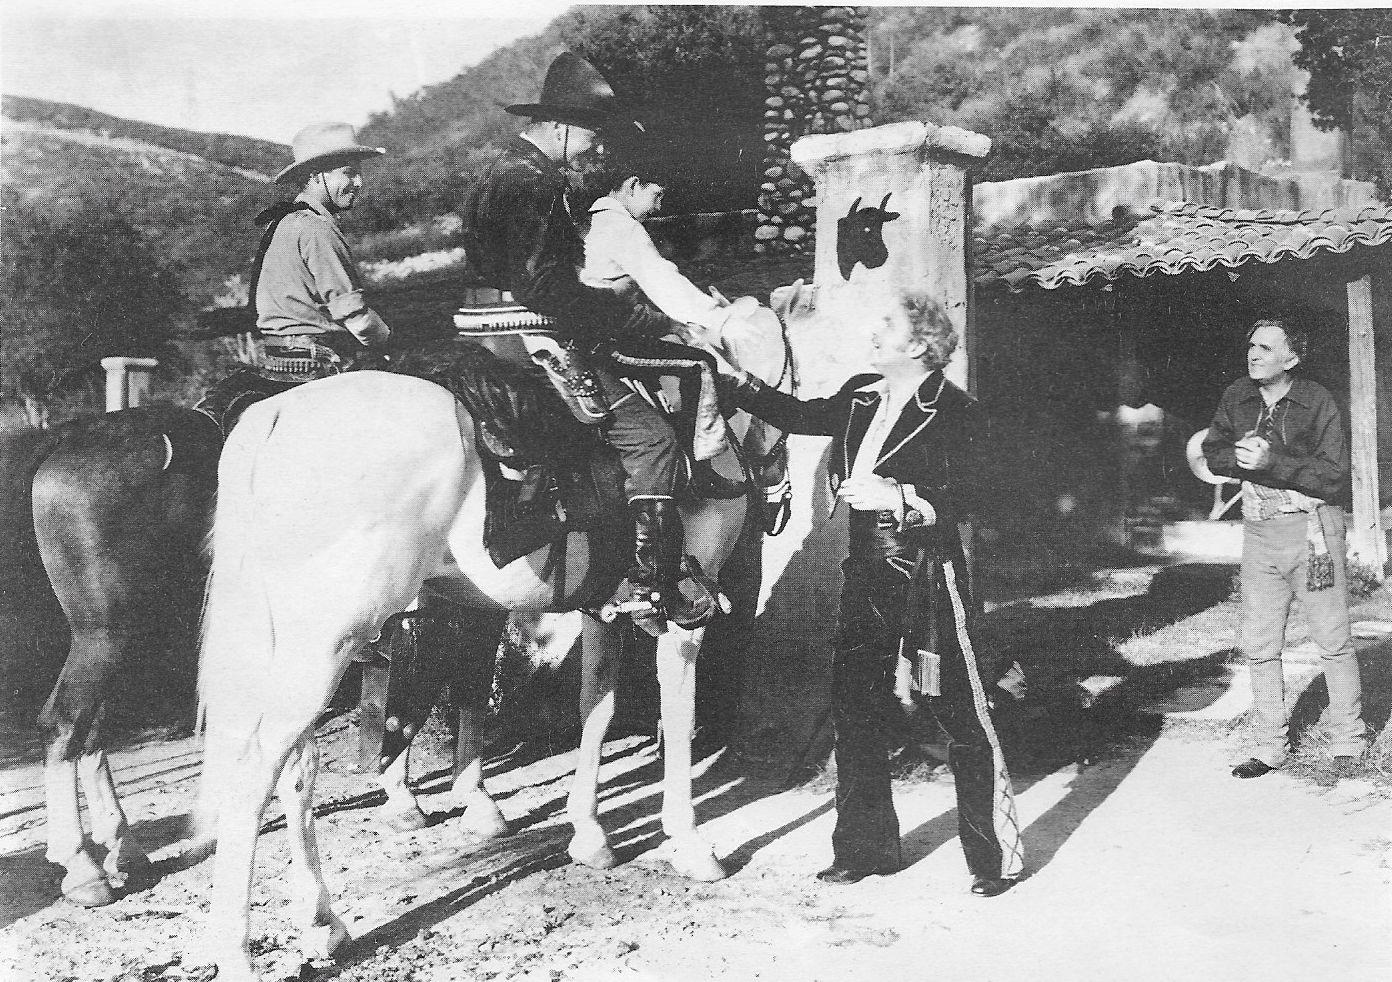 William Boyd, James Ellison, William Farnum, George Mari, and Juan Torena in The Eagle's Brood (1935)